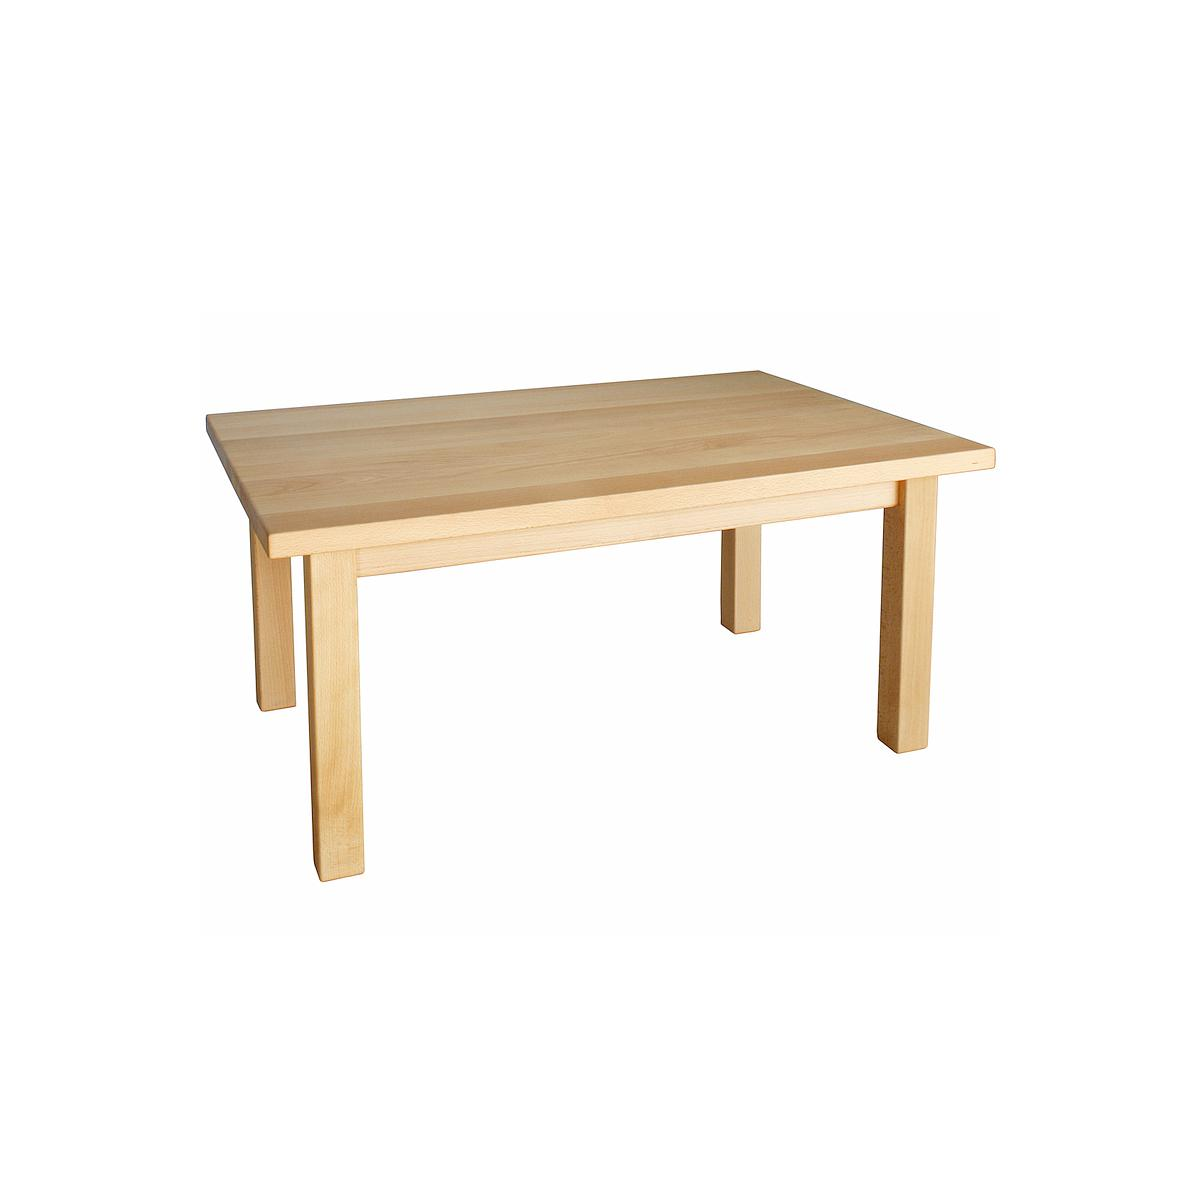 Table 60x90cm DETAIL De Breuyn bois massif-naturel